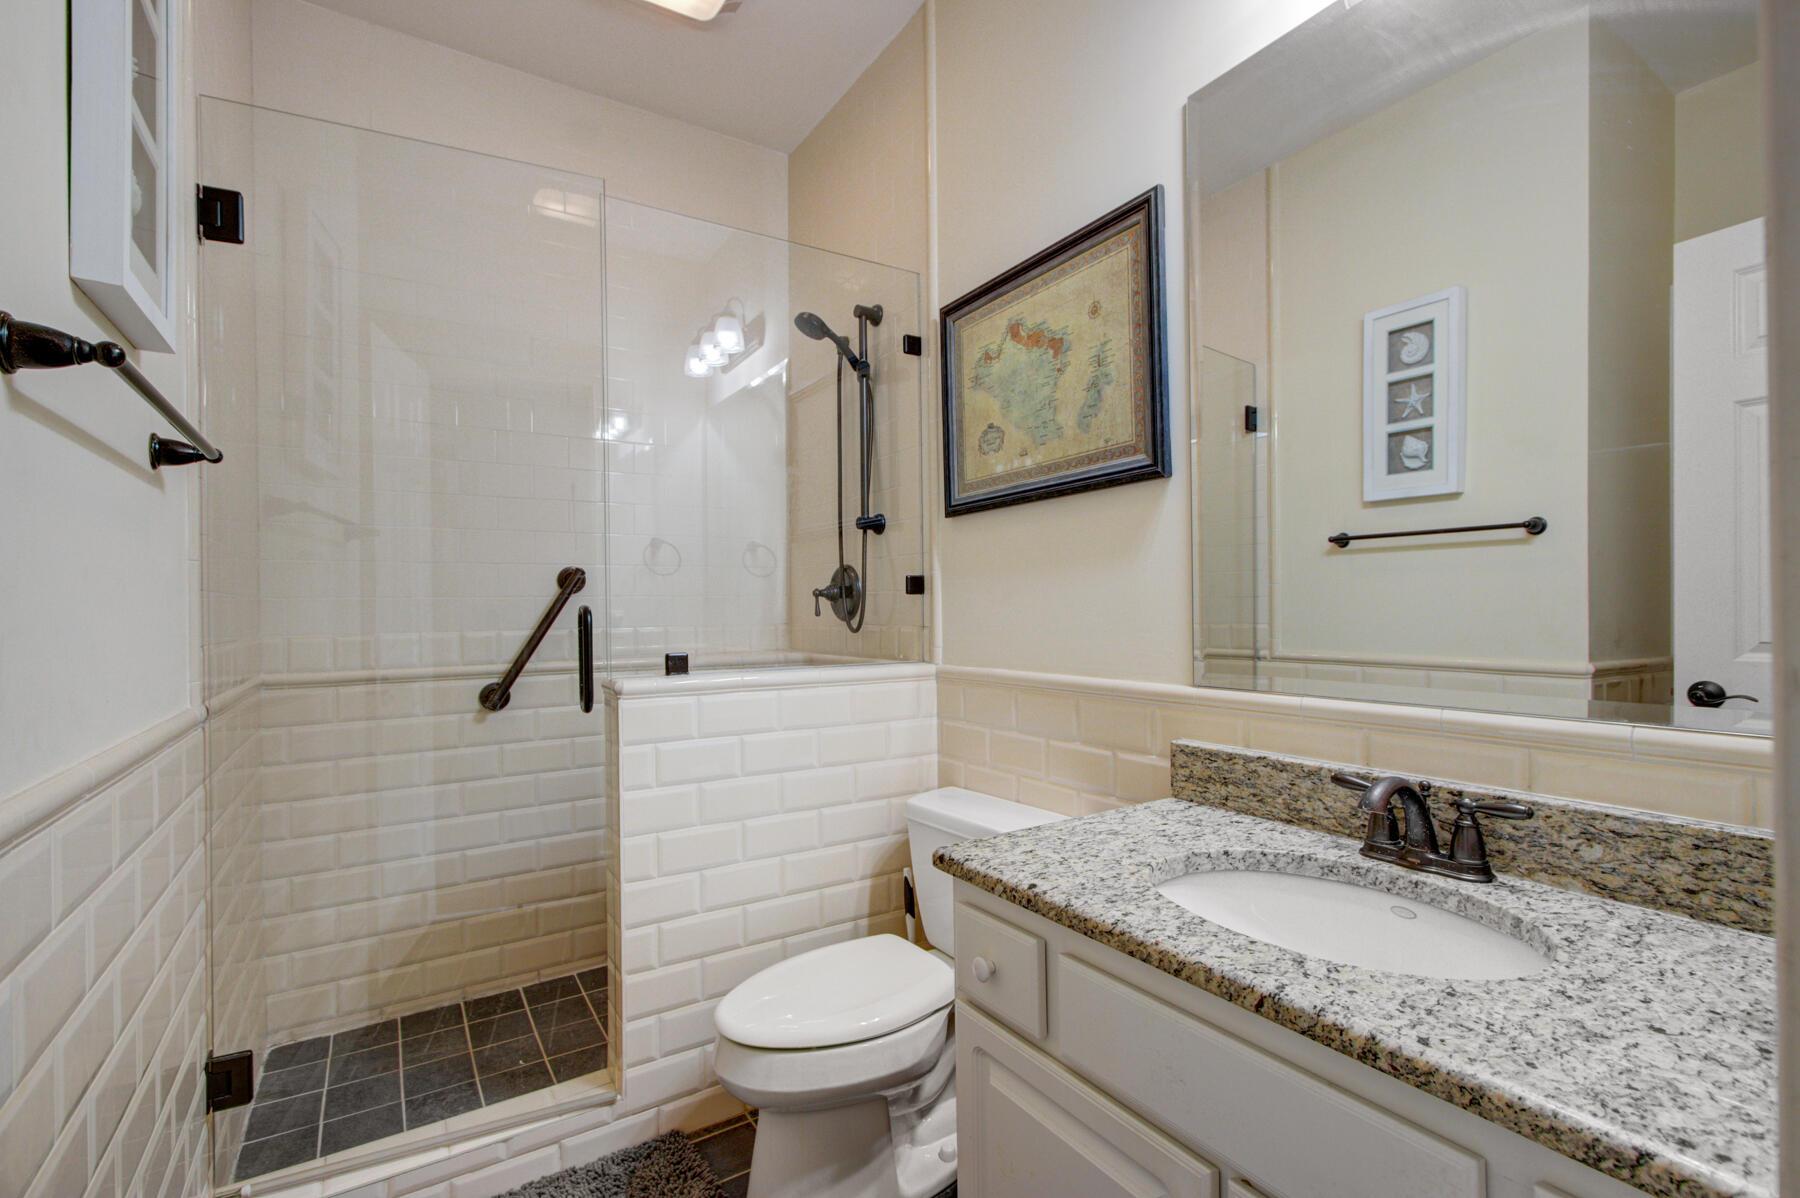 Dunes West Homes For Sale - 3095 Pignatelli, Mount Pleasant, SC - 1